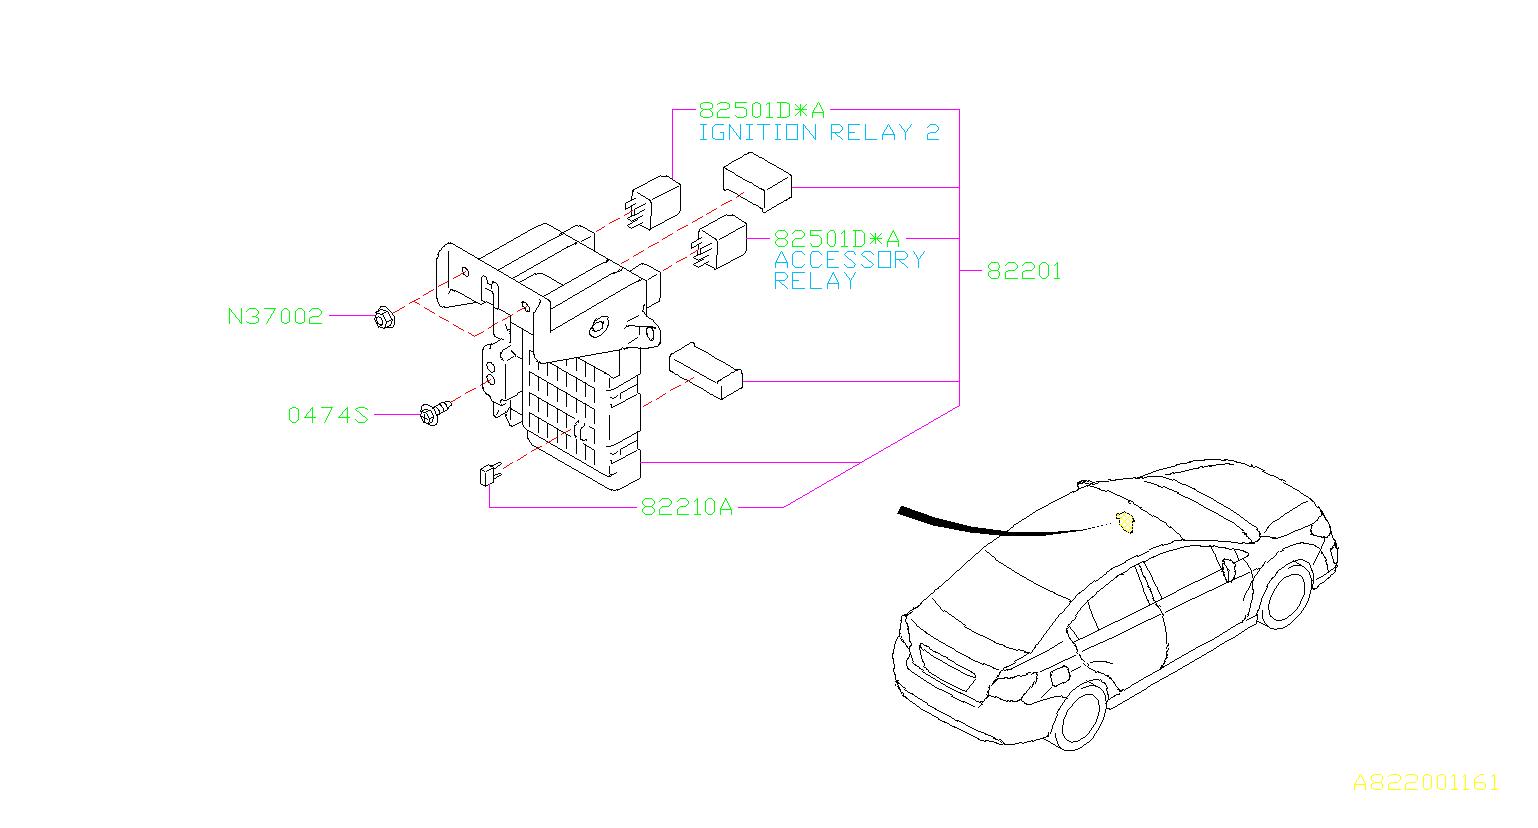 2015 Subaru Legacy Accessory Power Relay. BOX, FUSE, MAIN ...